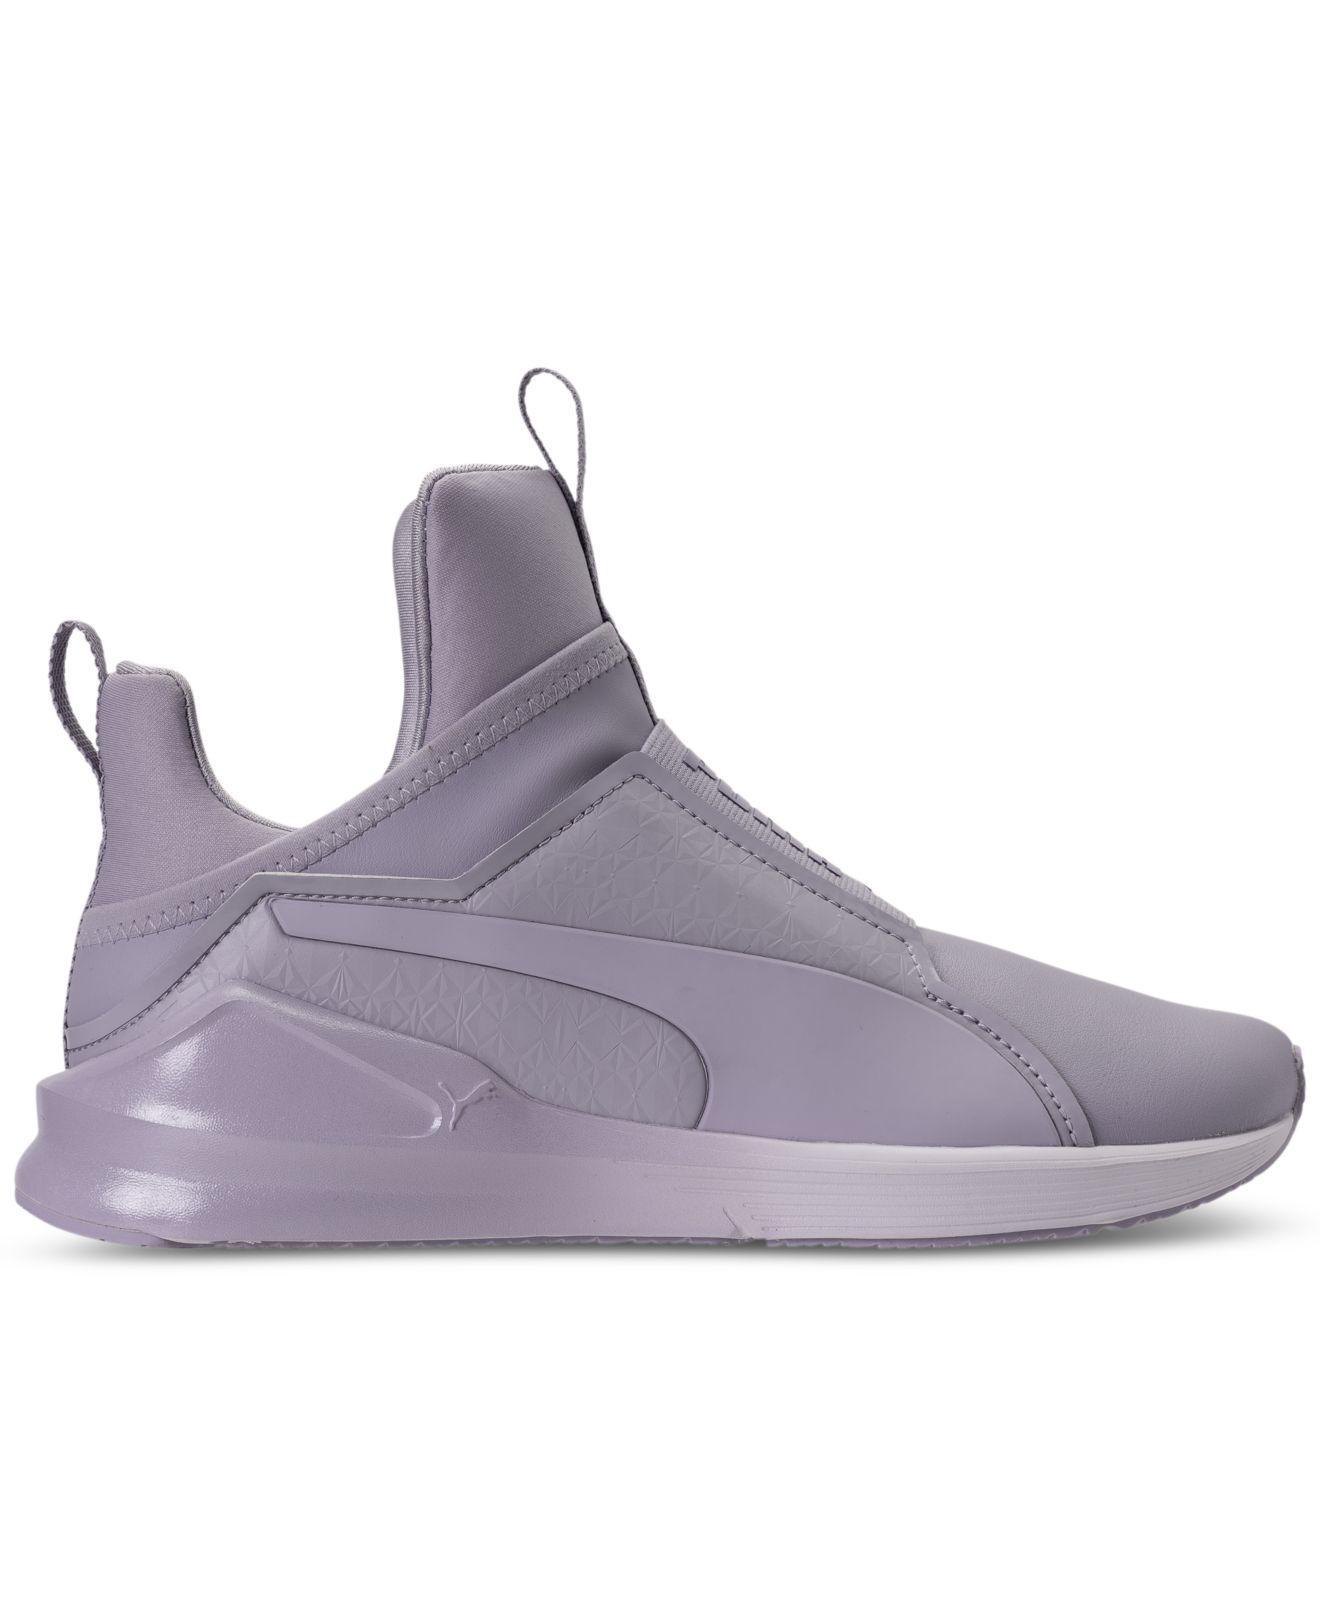 Lyst - PUMA Women s Fierce Chalet Casual Sneakers From Finish Line 425b185e3